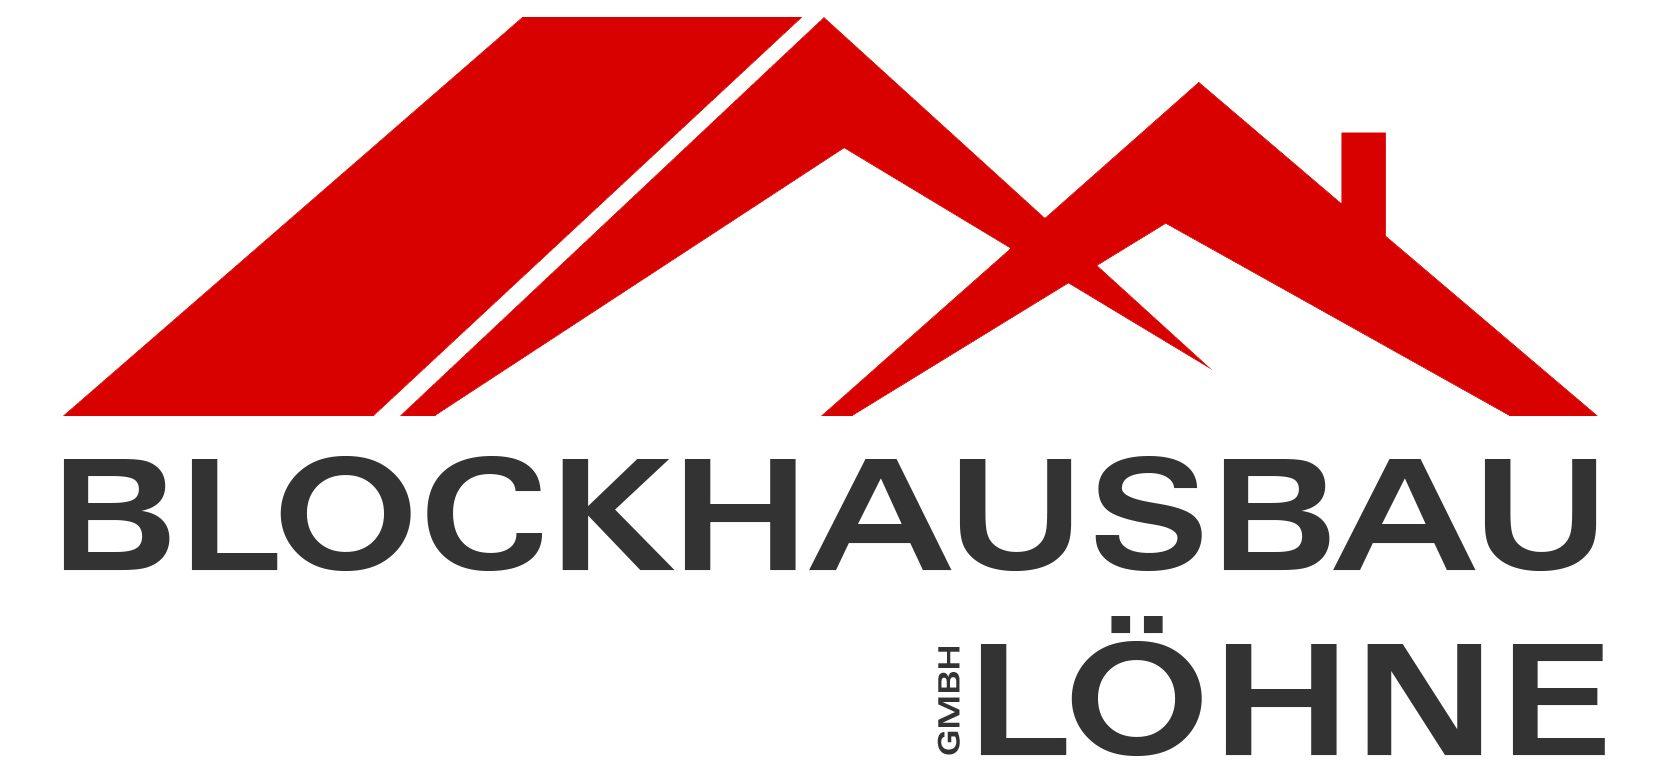 Blockhausbau GmbH Löhne